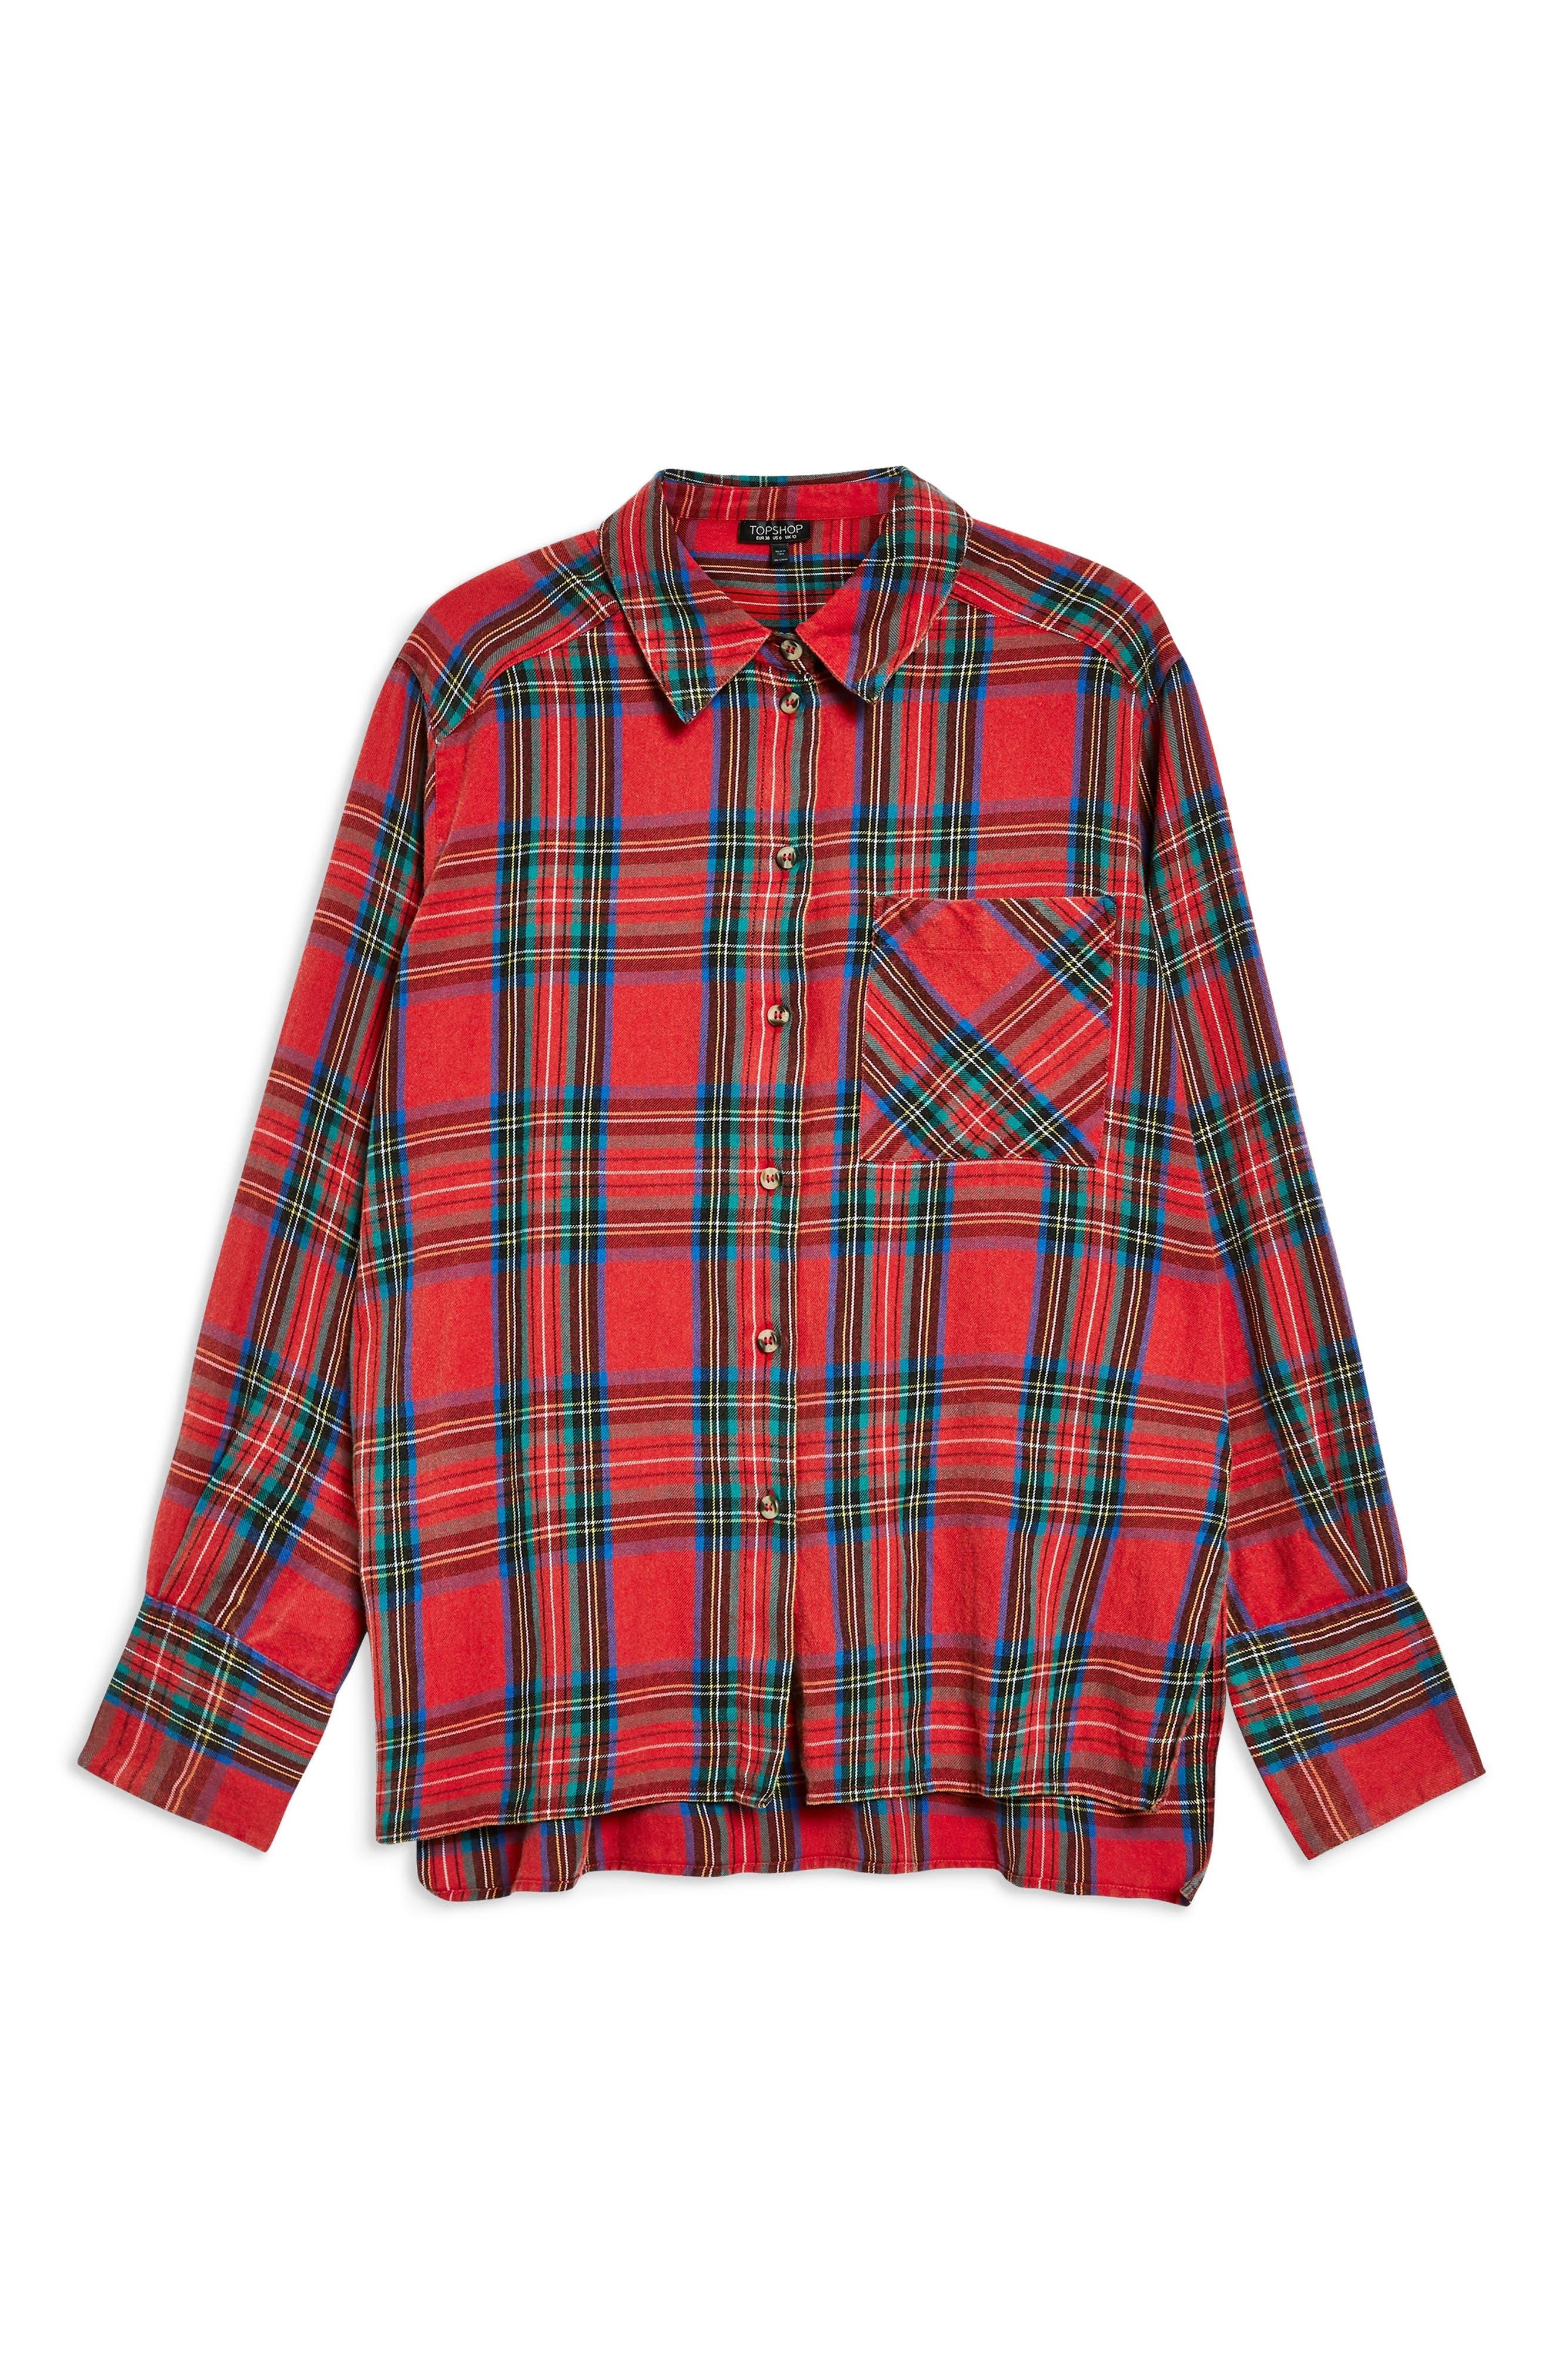 Plaid Shirt,                             Alternate thumbnail 4, color,                             600